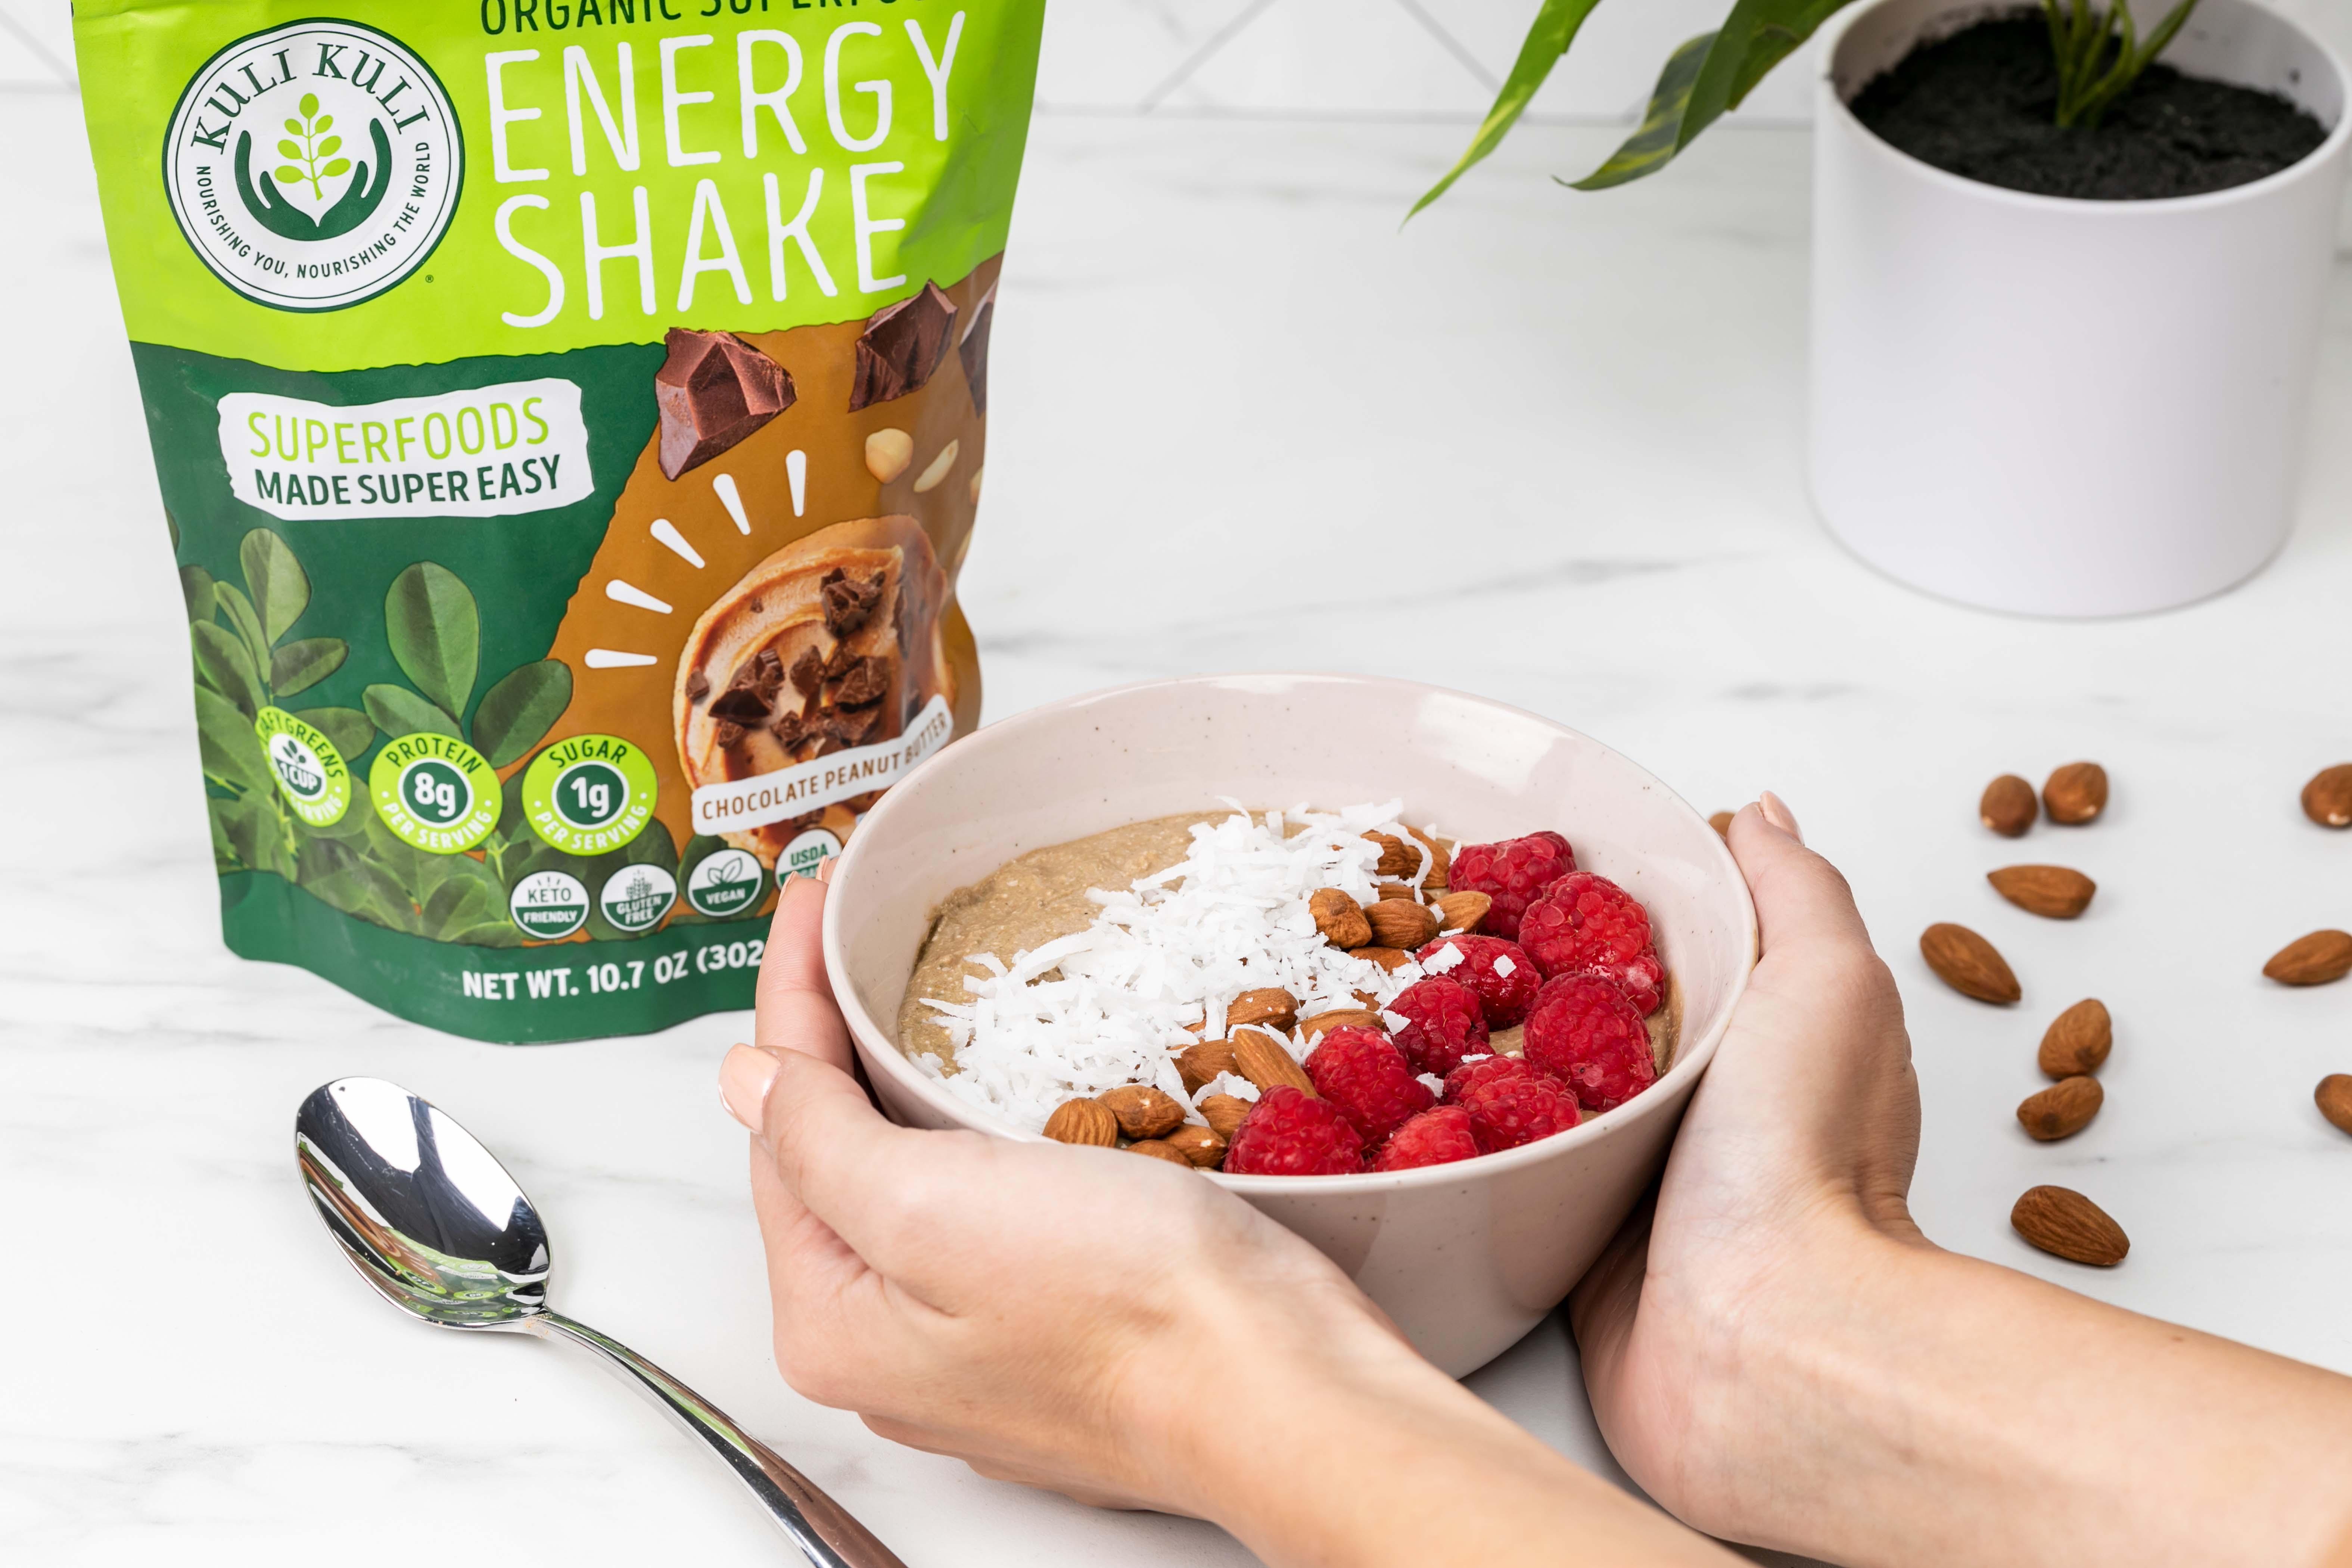 Organic Superfood Energy Shake